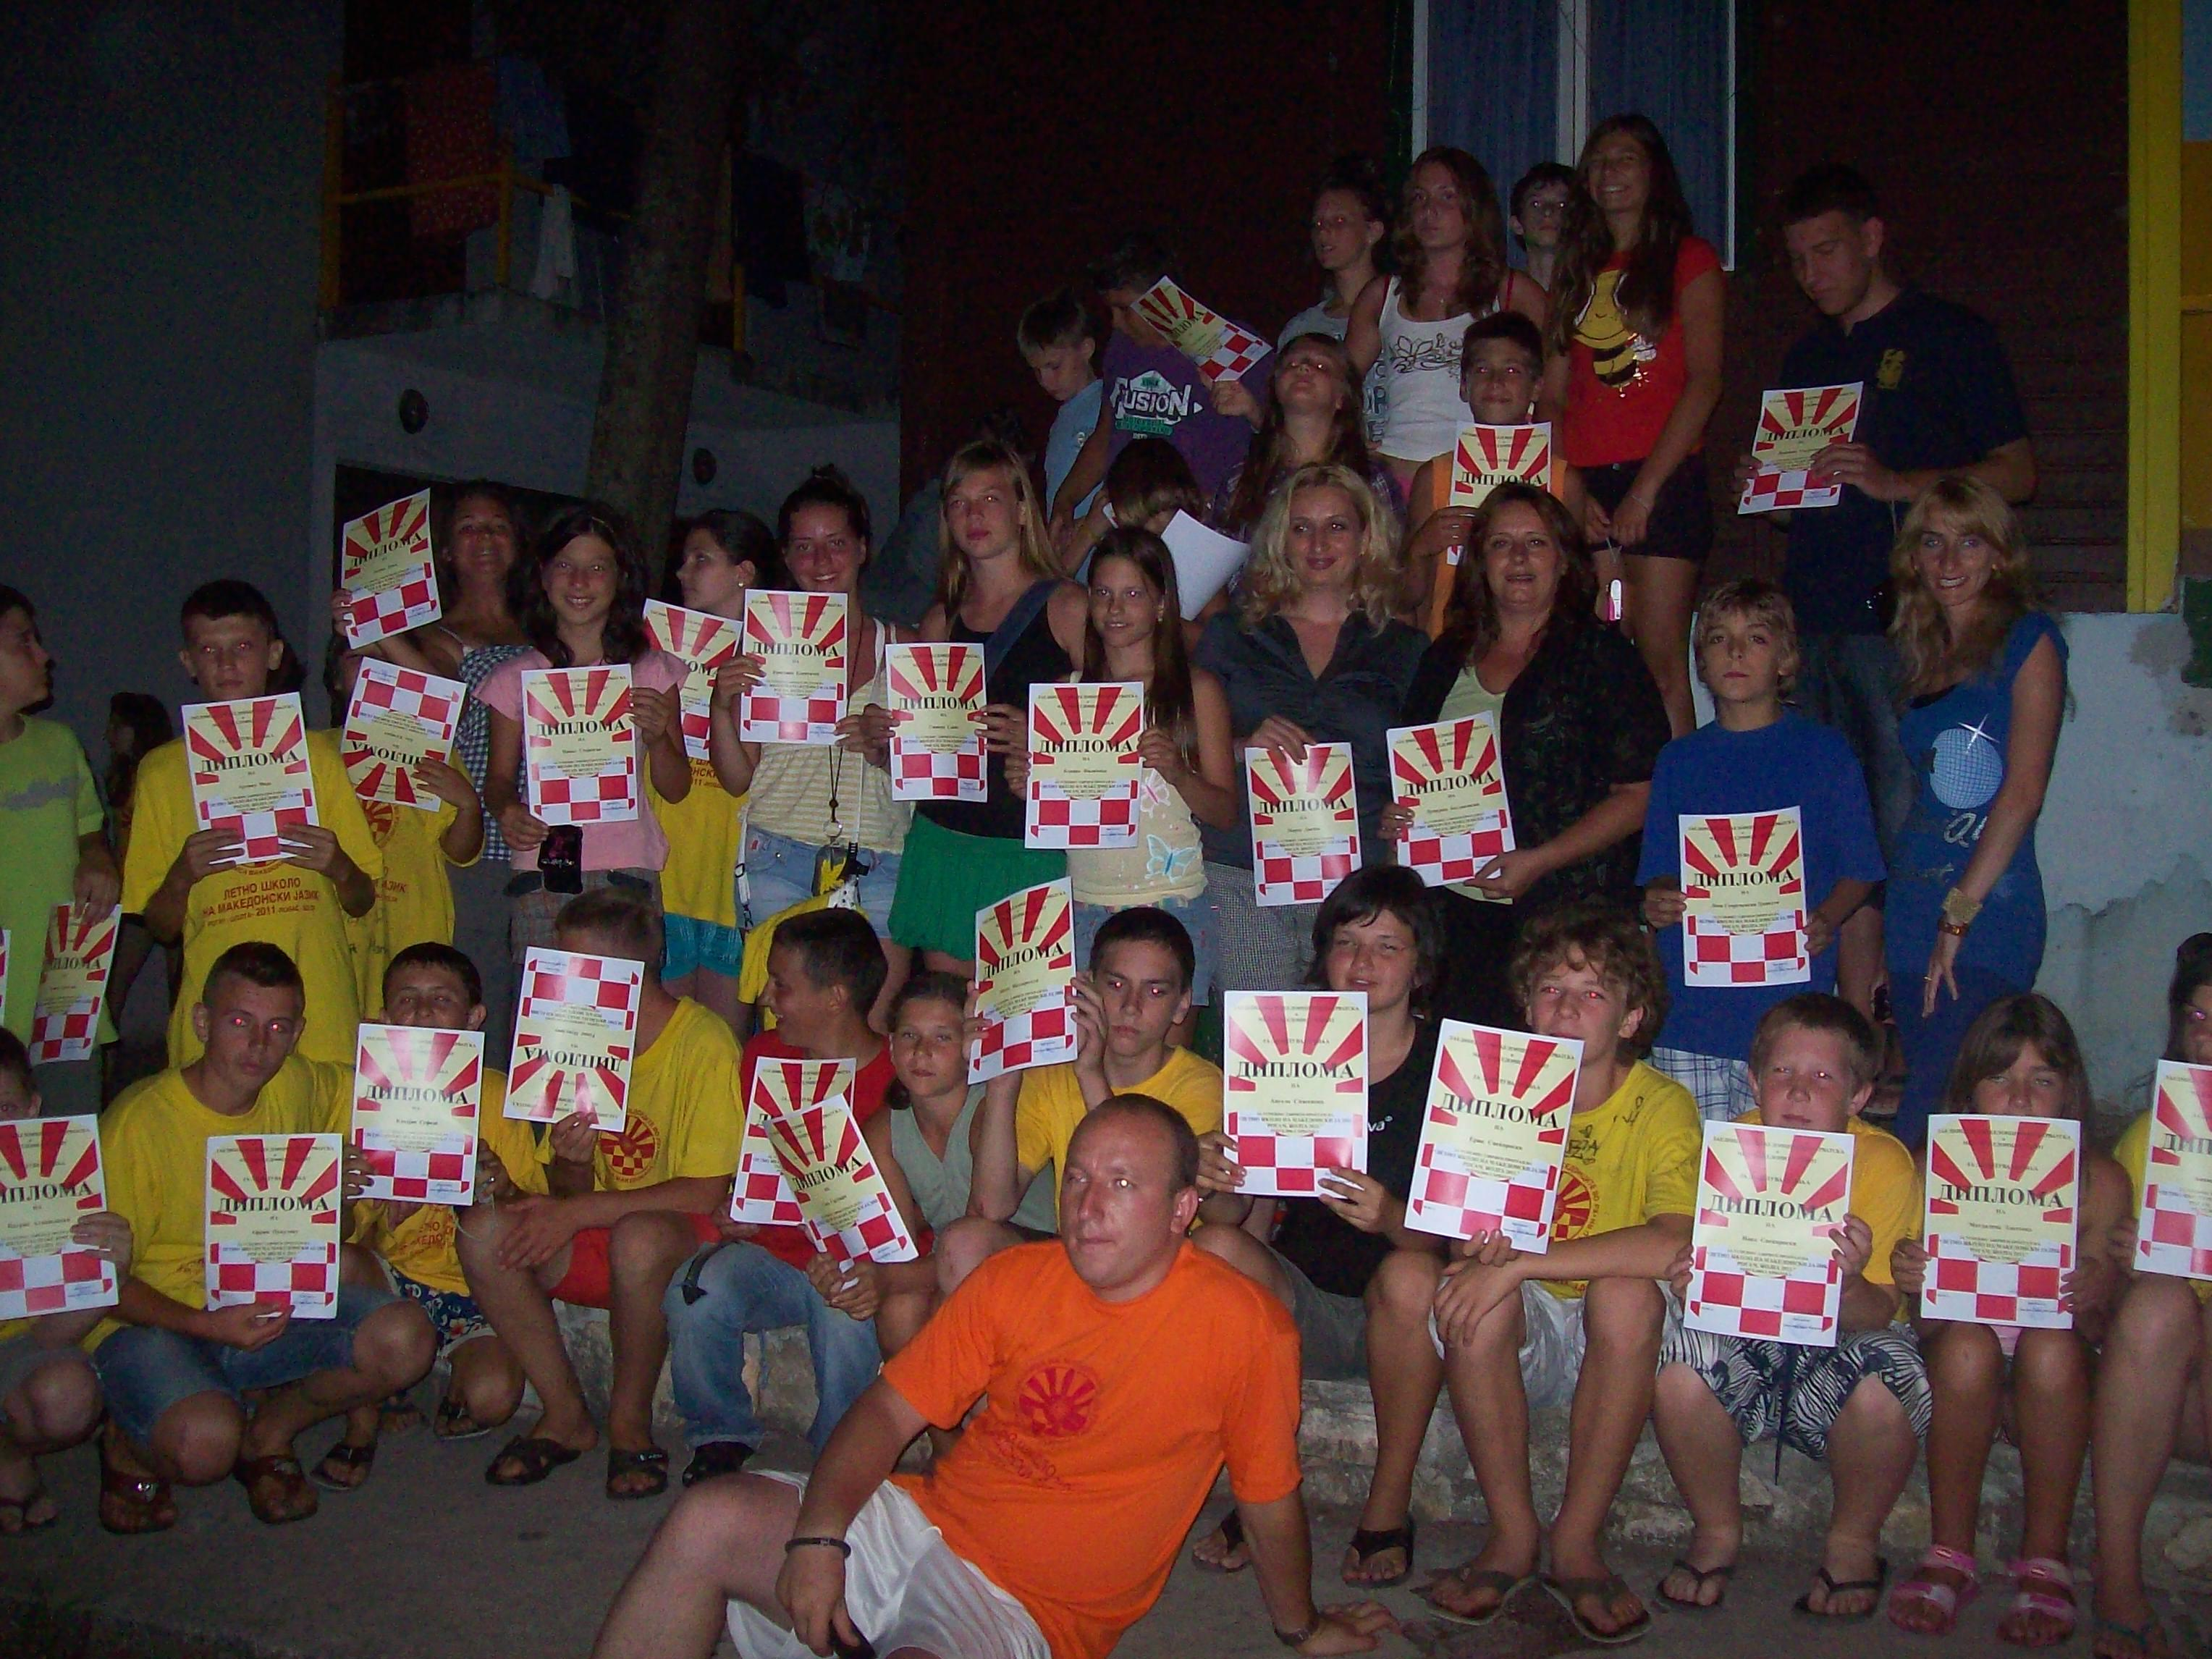 Ljetna škola makedonskog jezika na Šolti